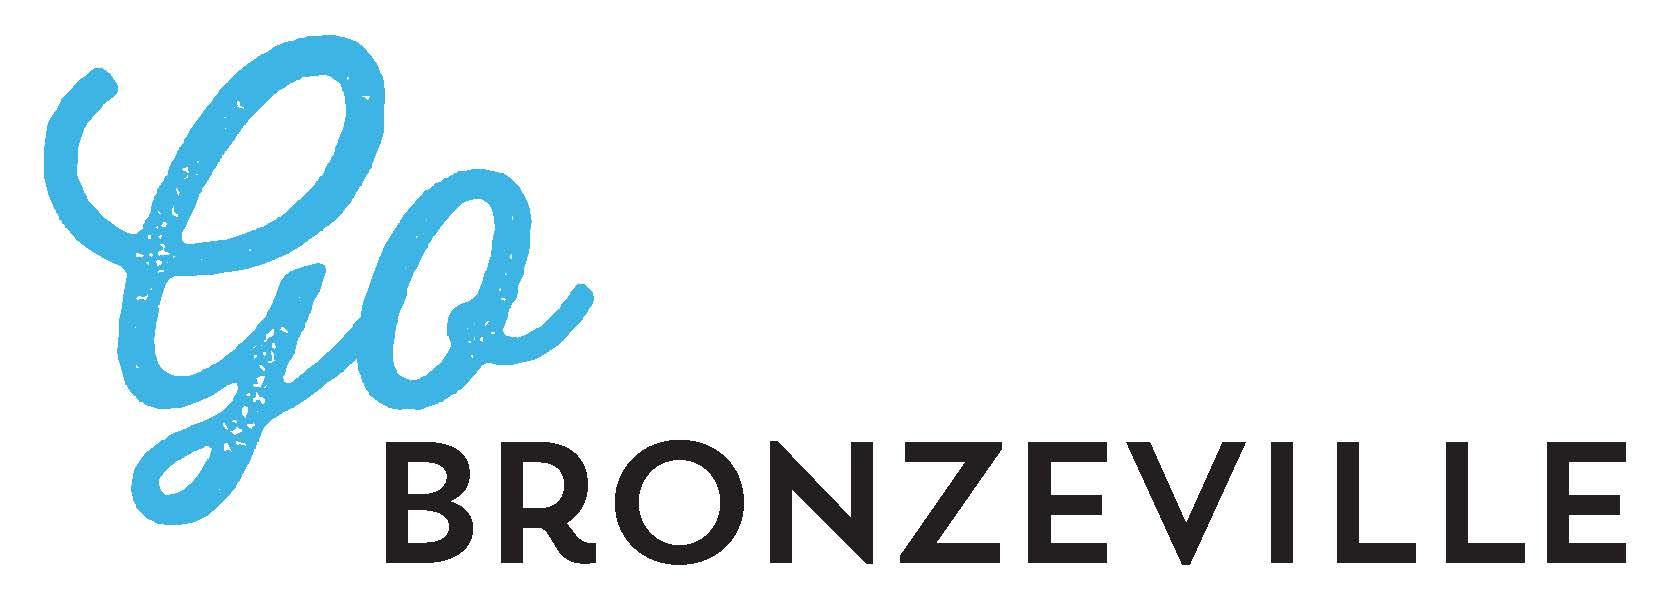 GoBronzeville Logo